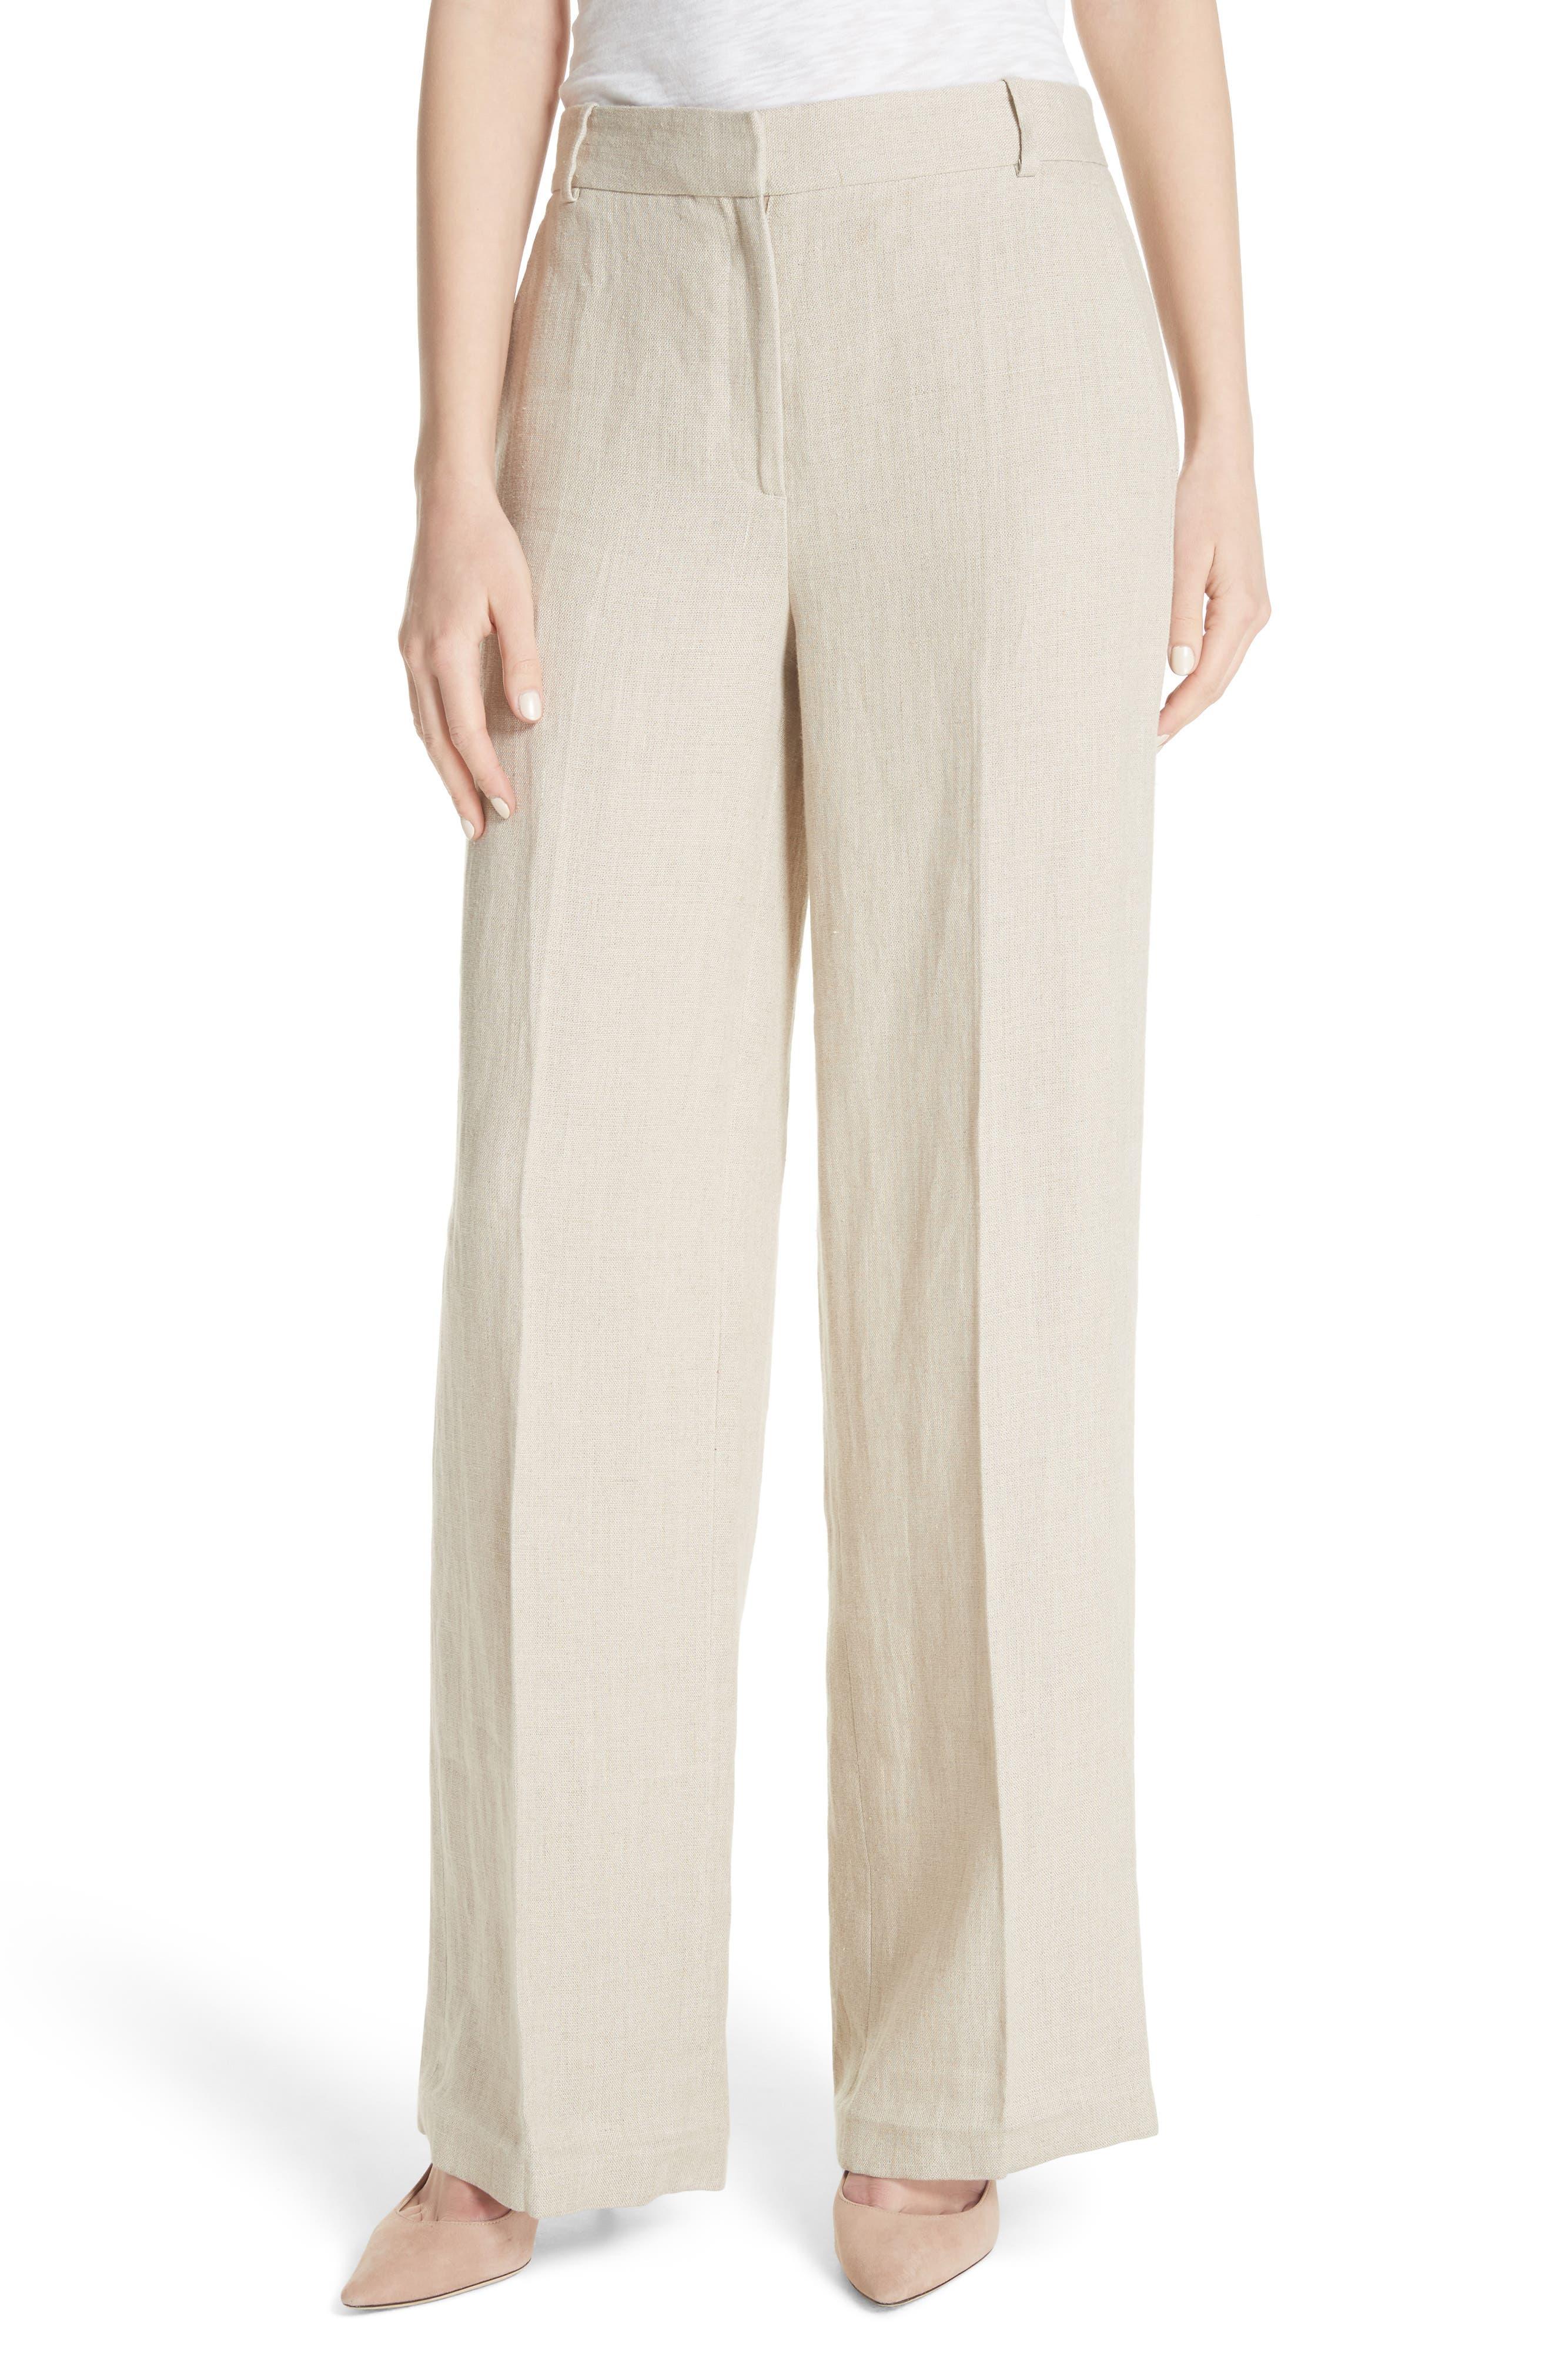 Piazza Integrate Wide Leg Linen Pants,                             Main thumbnail 1, color,                             250